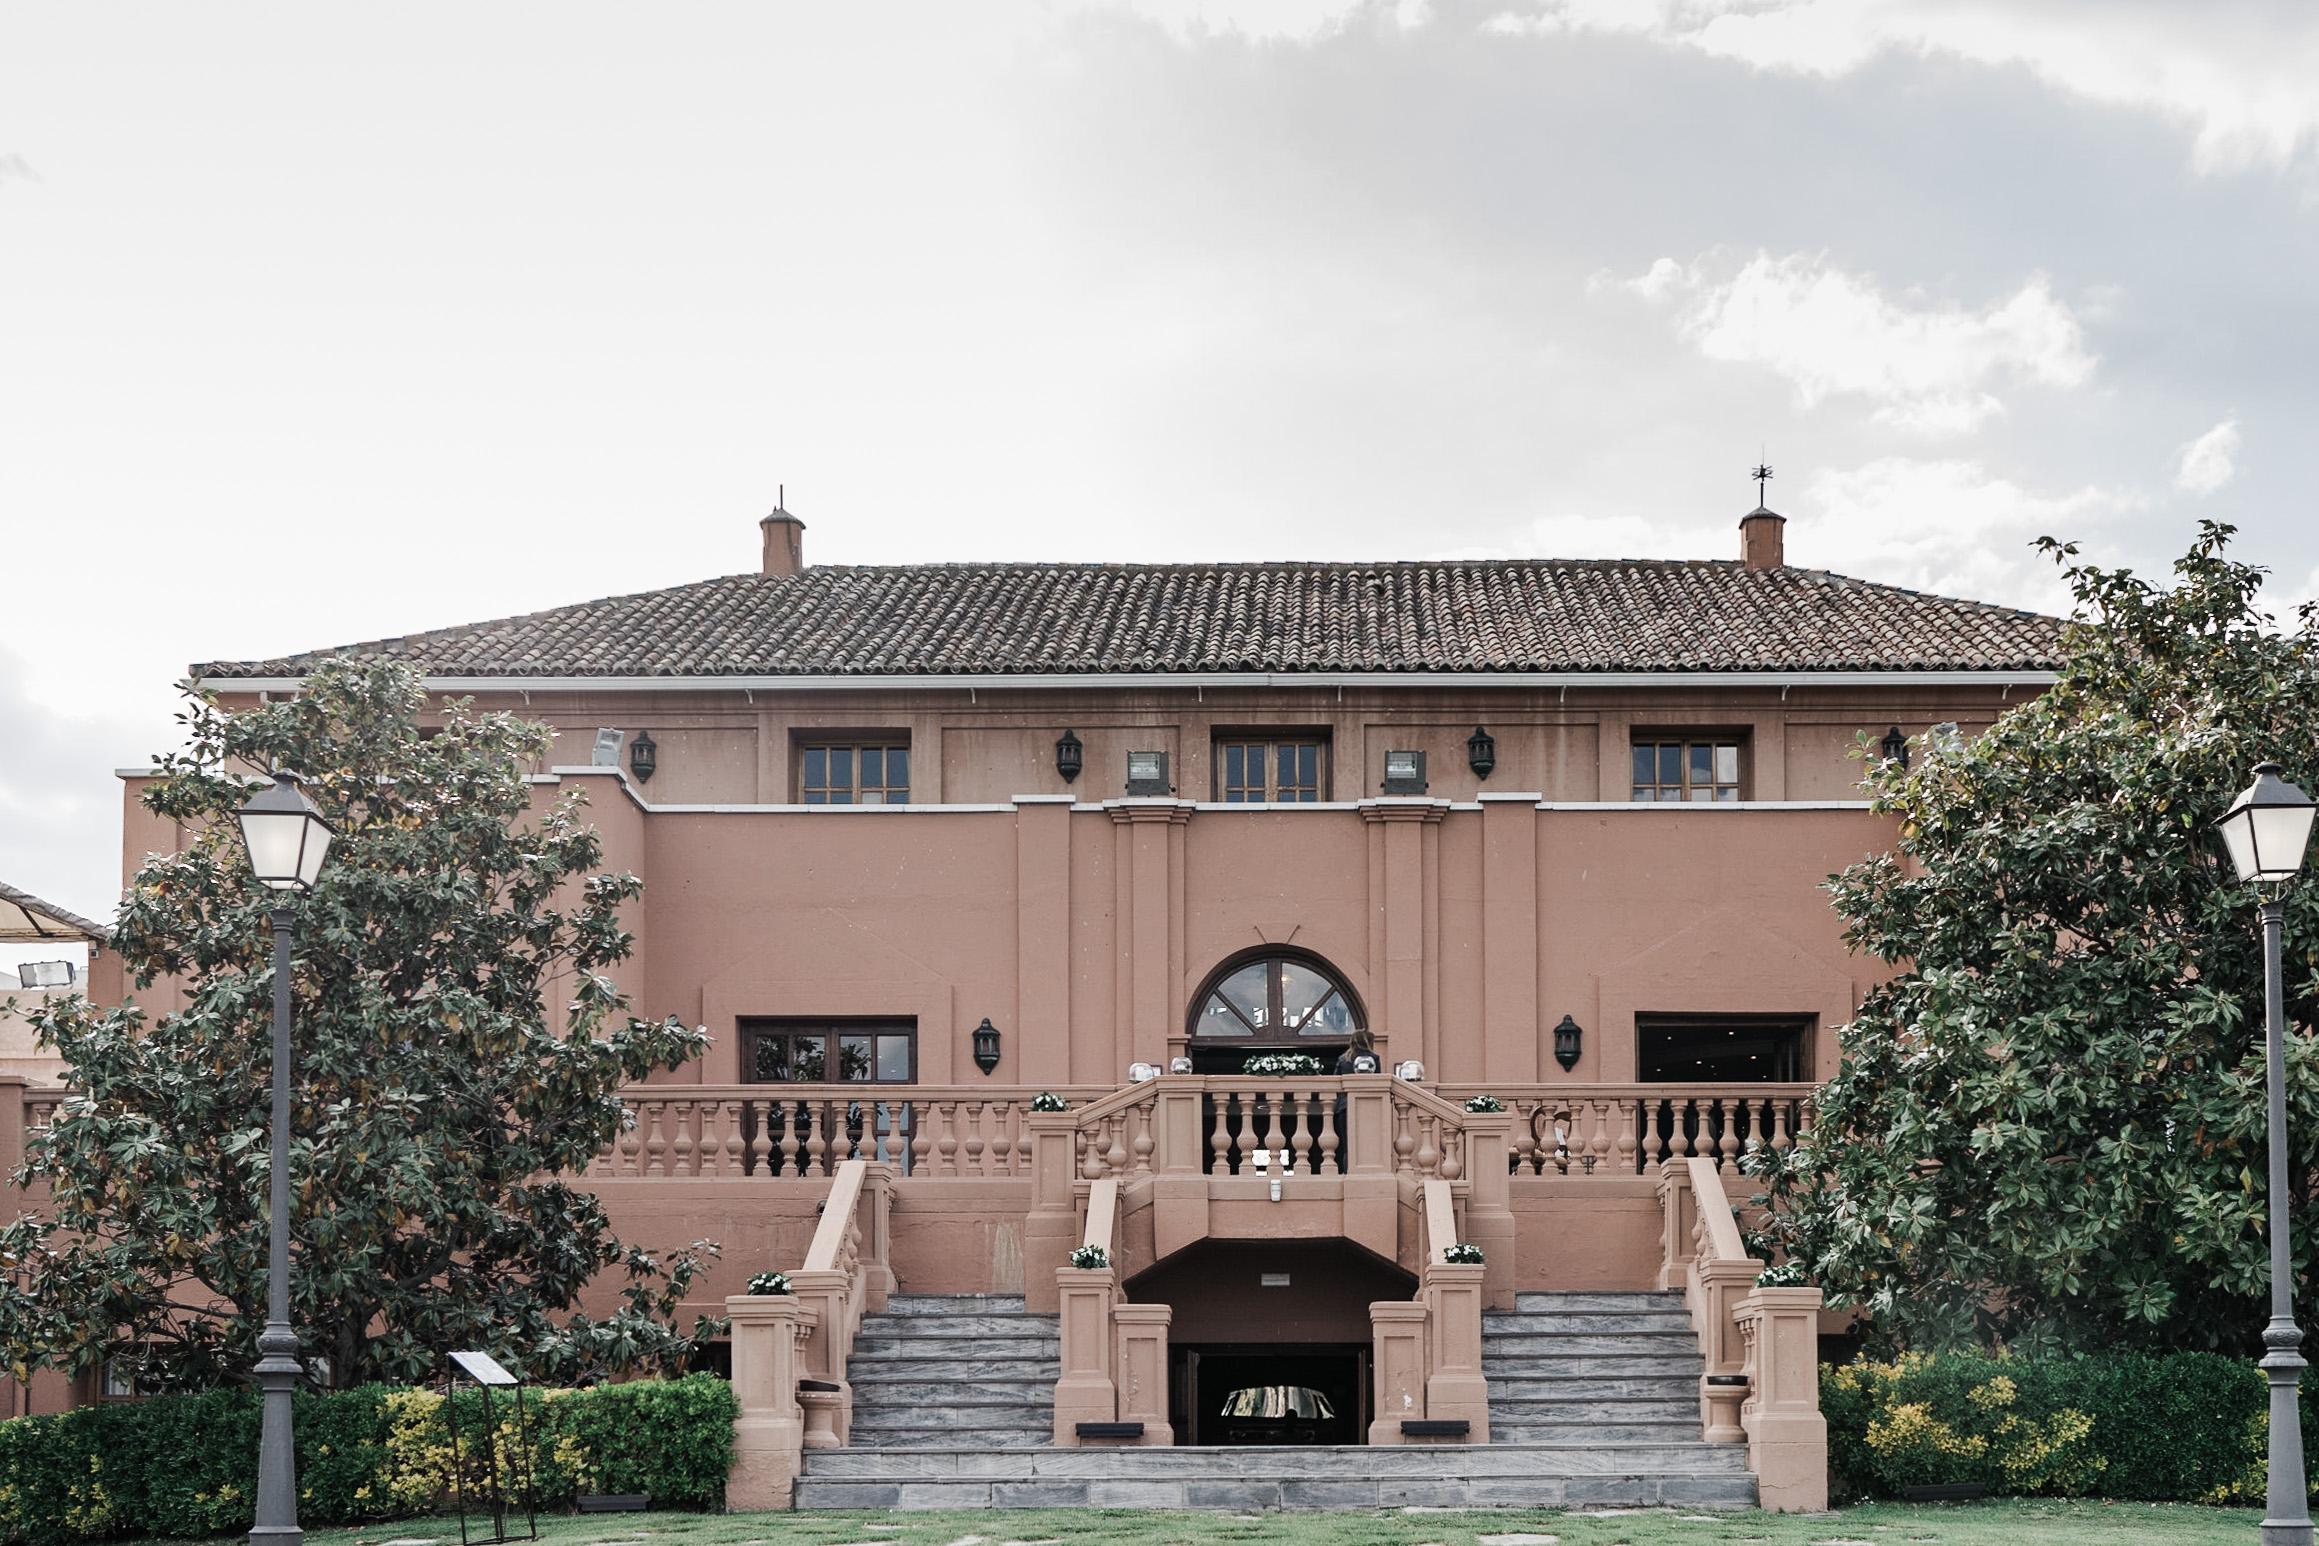 TLB_CJ_Fotografos_Bodas_Madrid_Dehesa_004.JPG